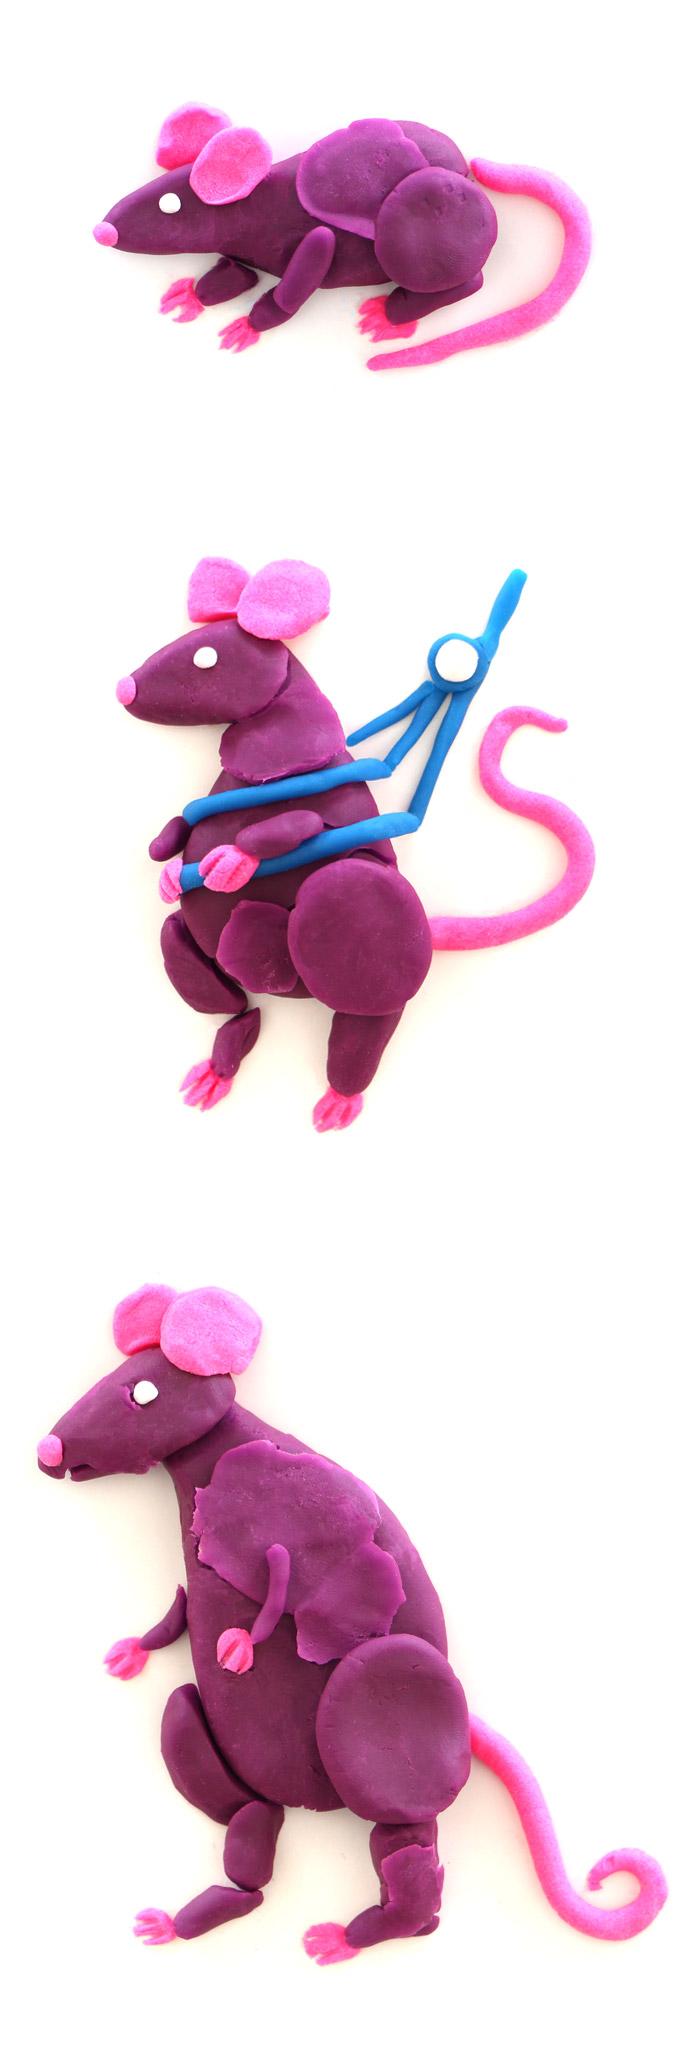 evolution_ratten